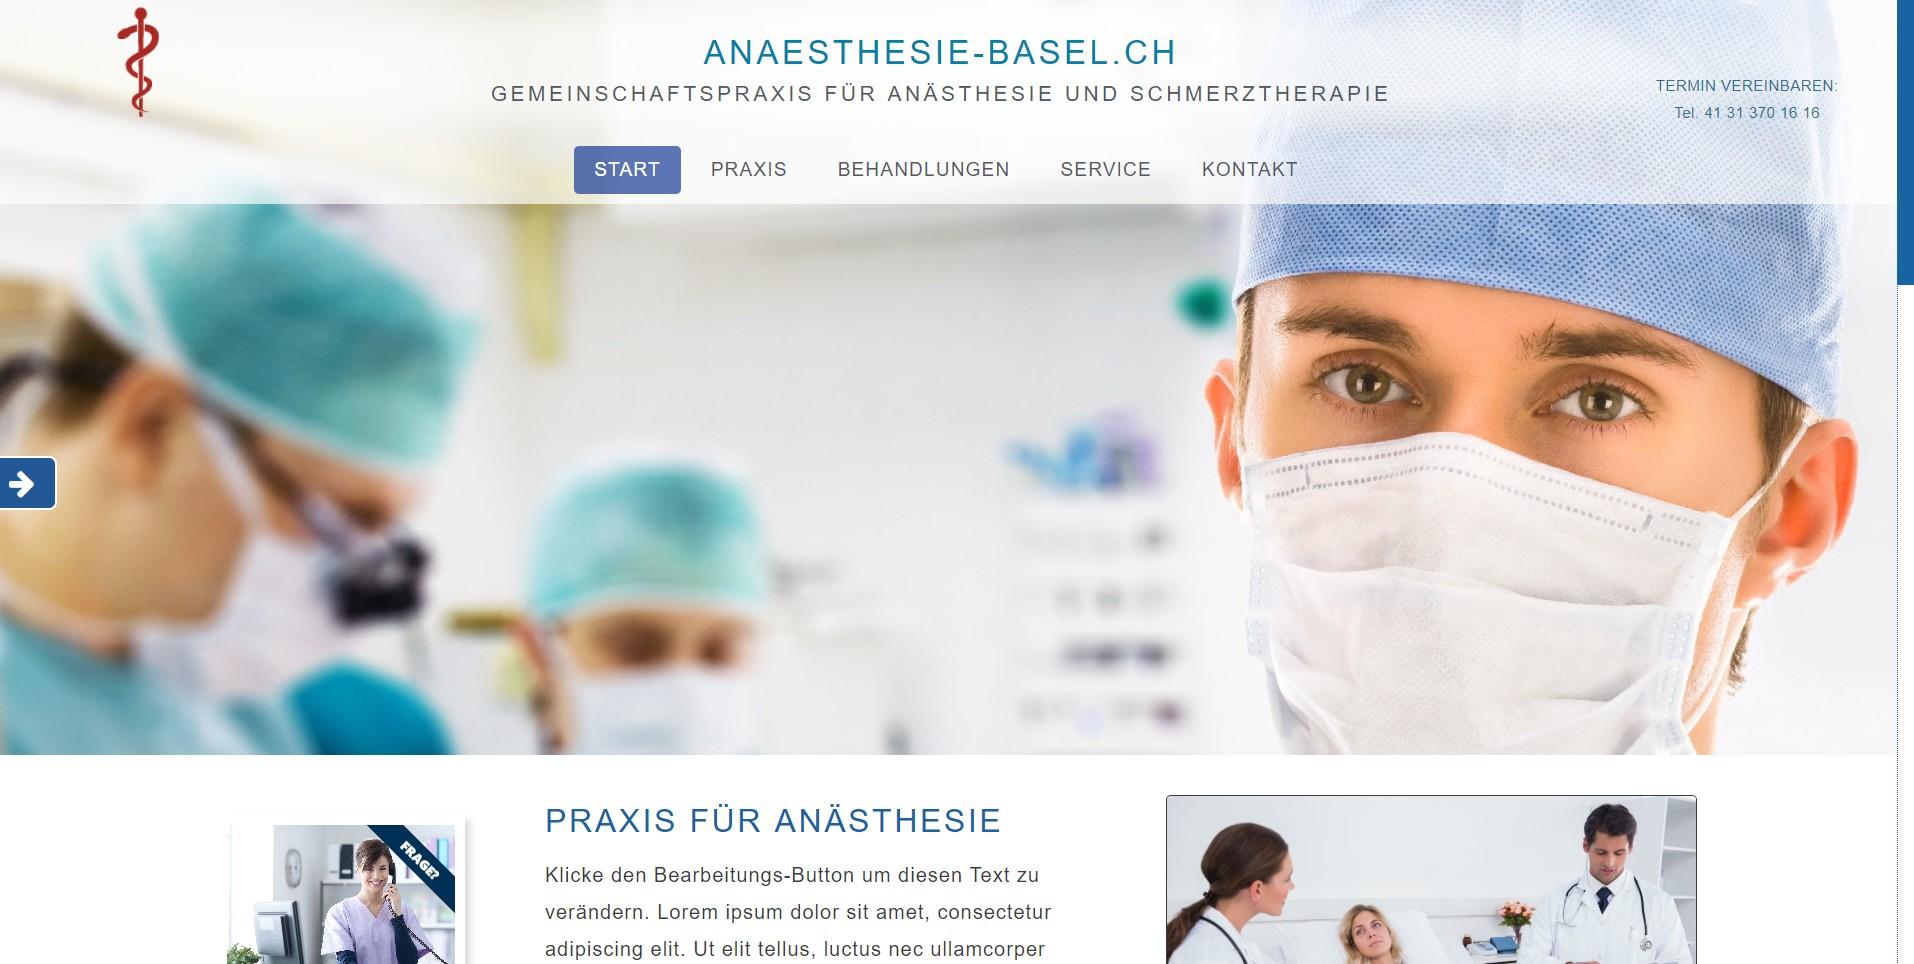 Anaesthesie-Basel.ch